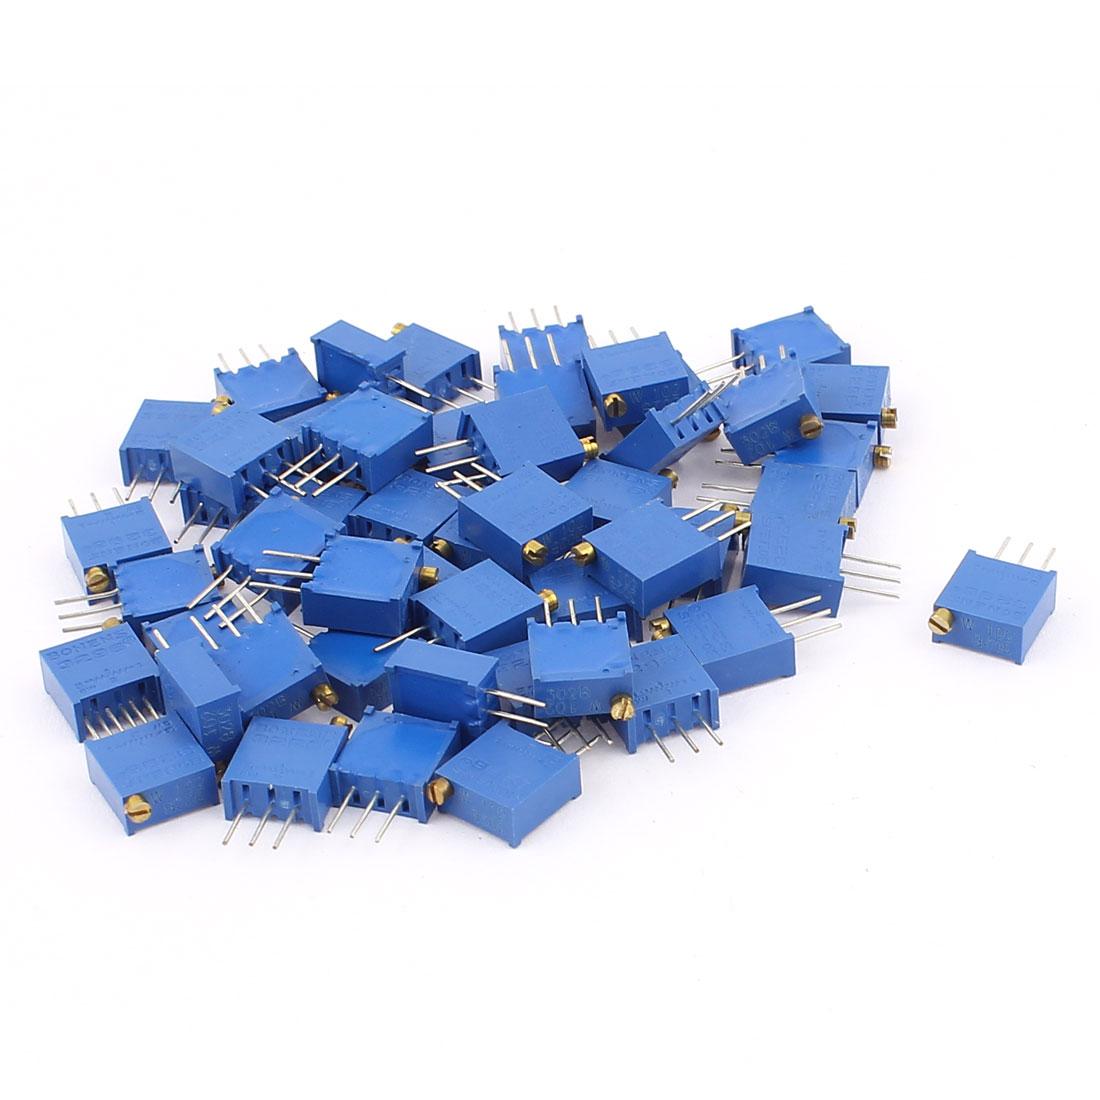 50Pcs 3296W-102 1K Ohm Resistor Trim Pot Potentiometer Trimmer Blue